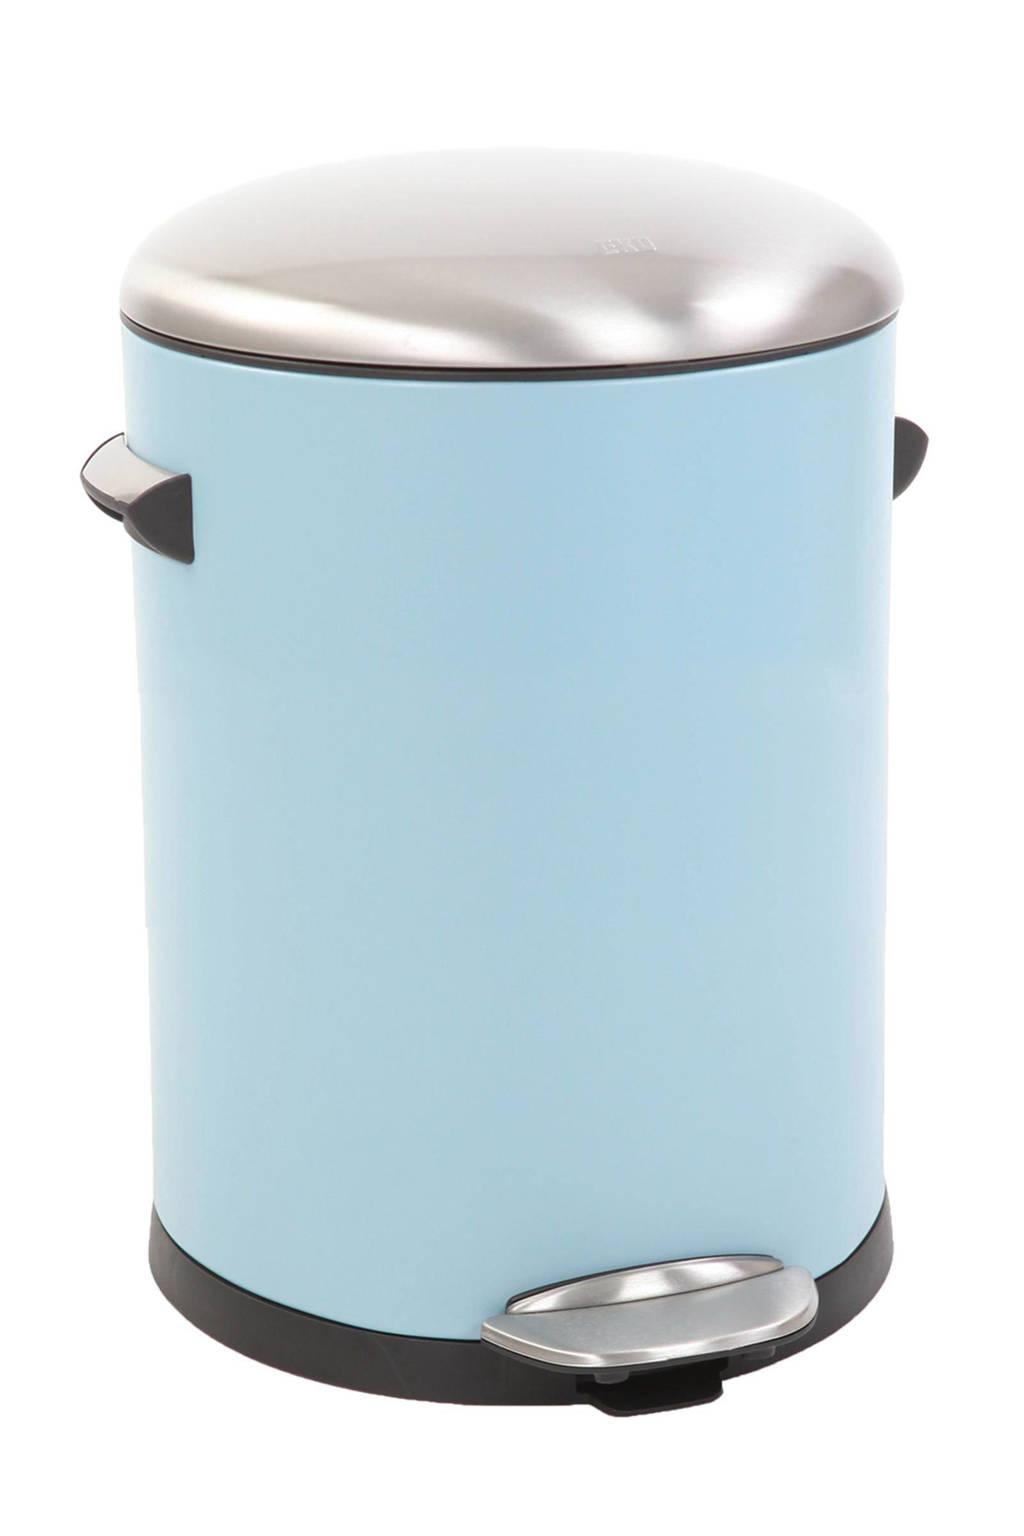 EKO Belle Deluxe pedaalemmer  (3 liter) Blauw